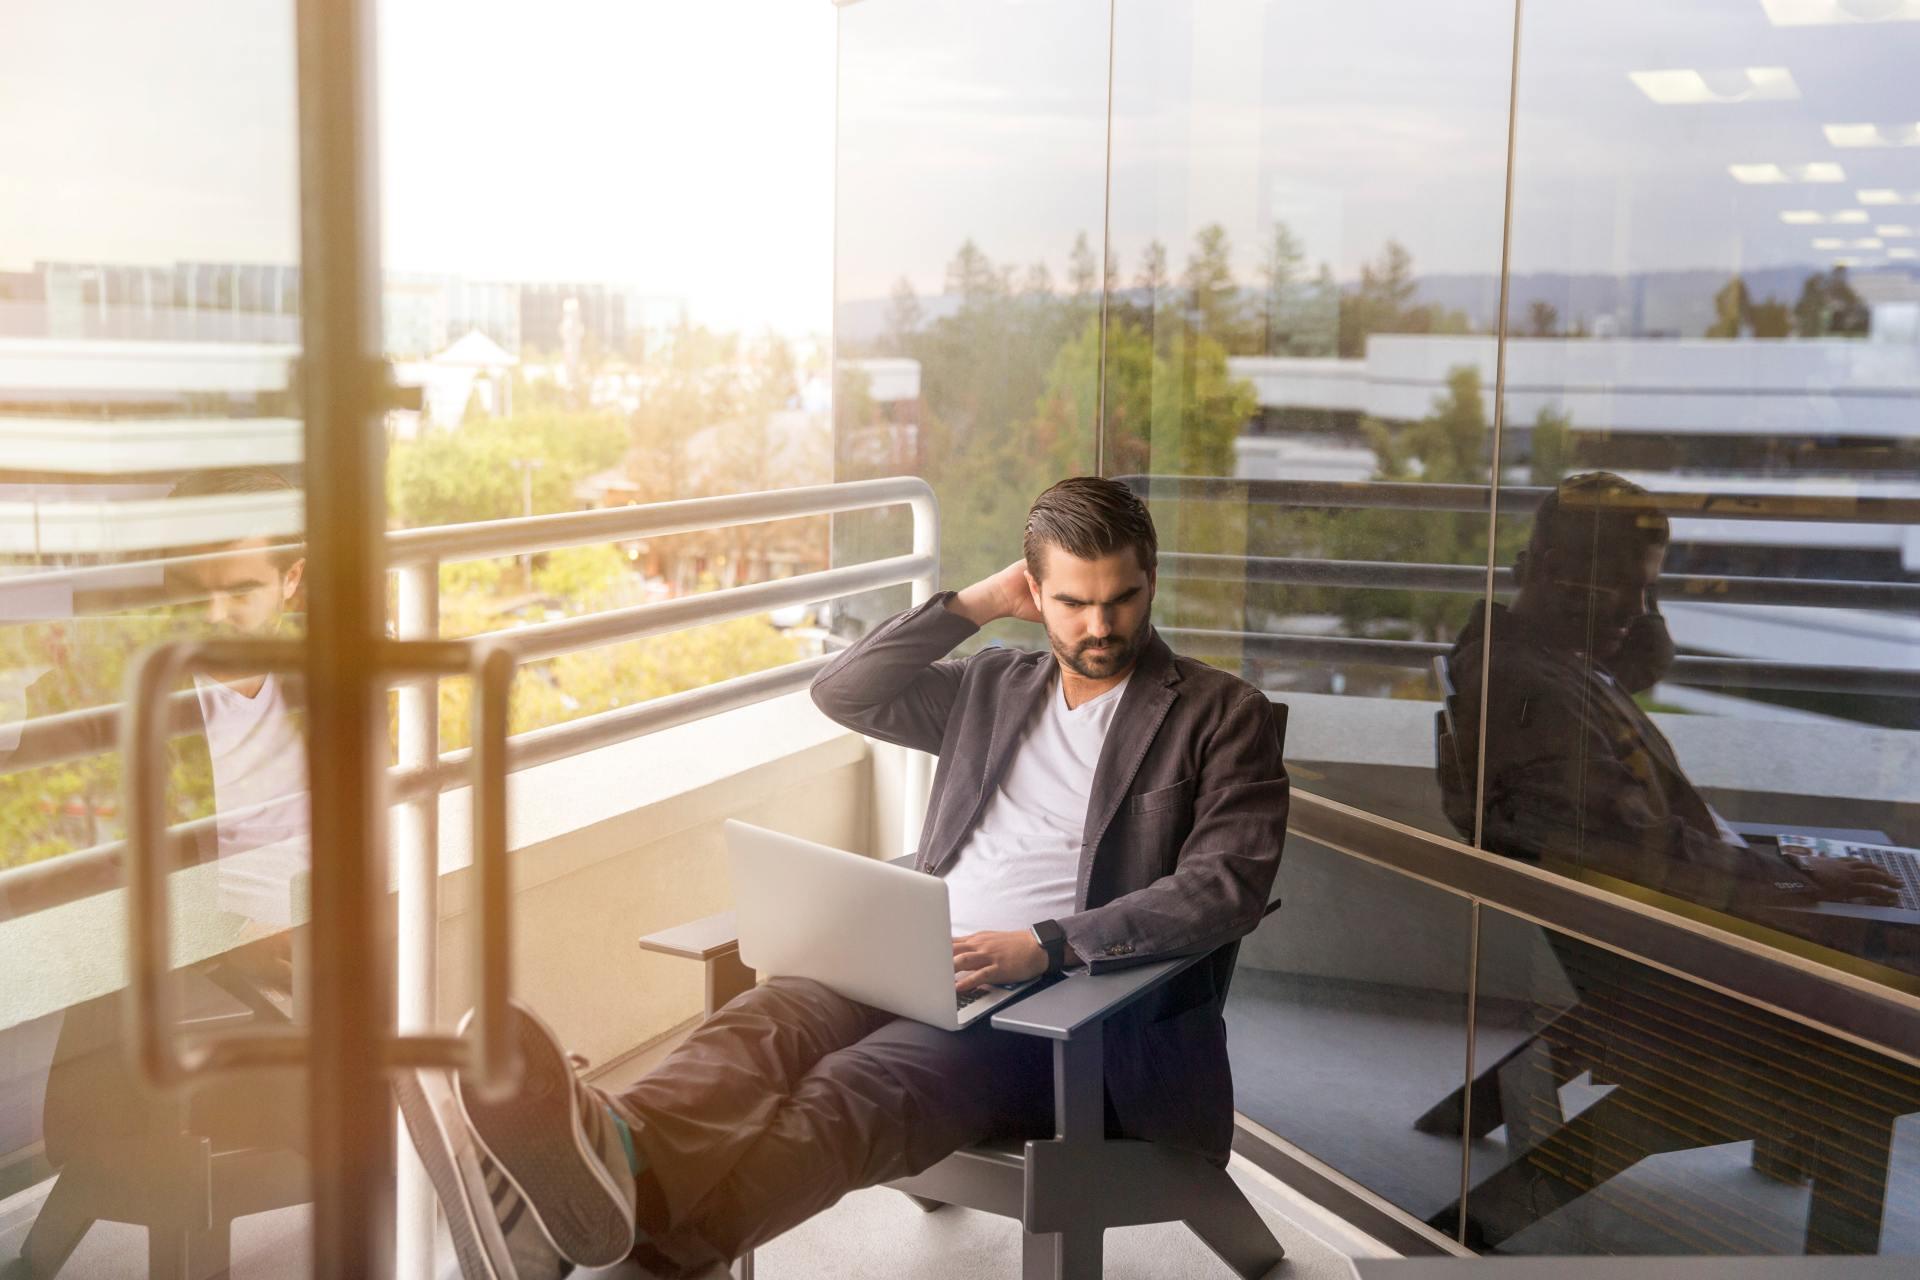 Man sits outside pondering work